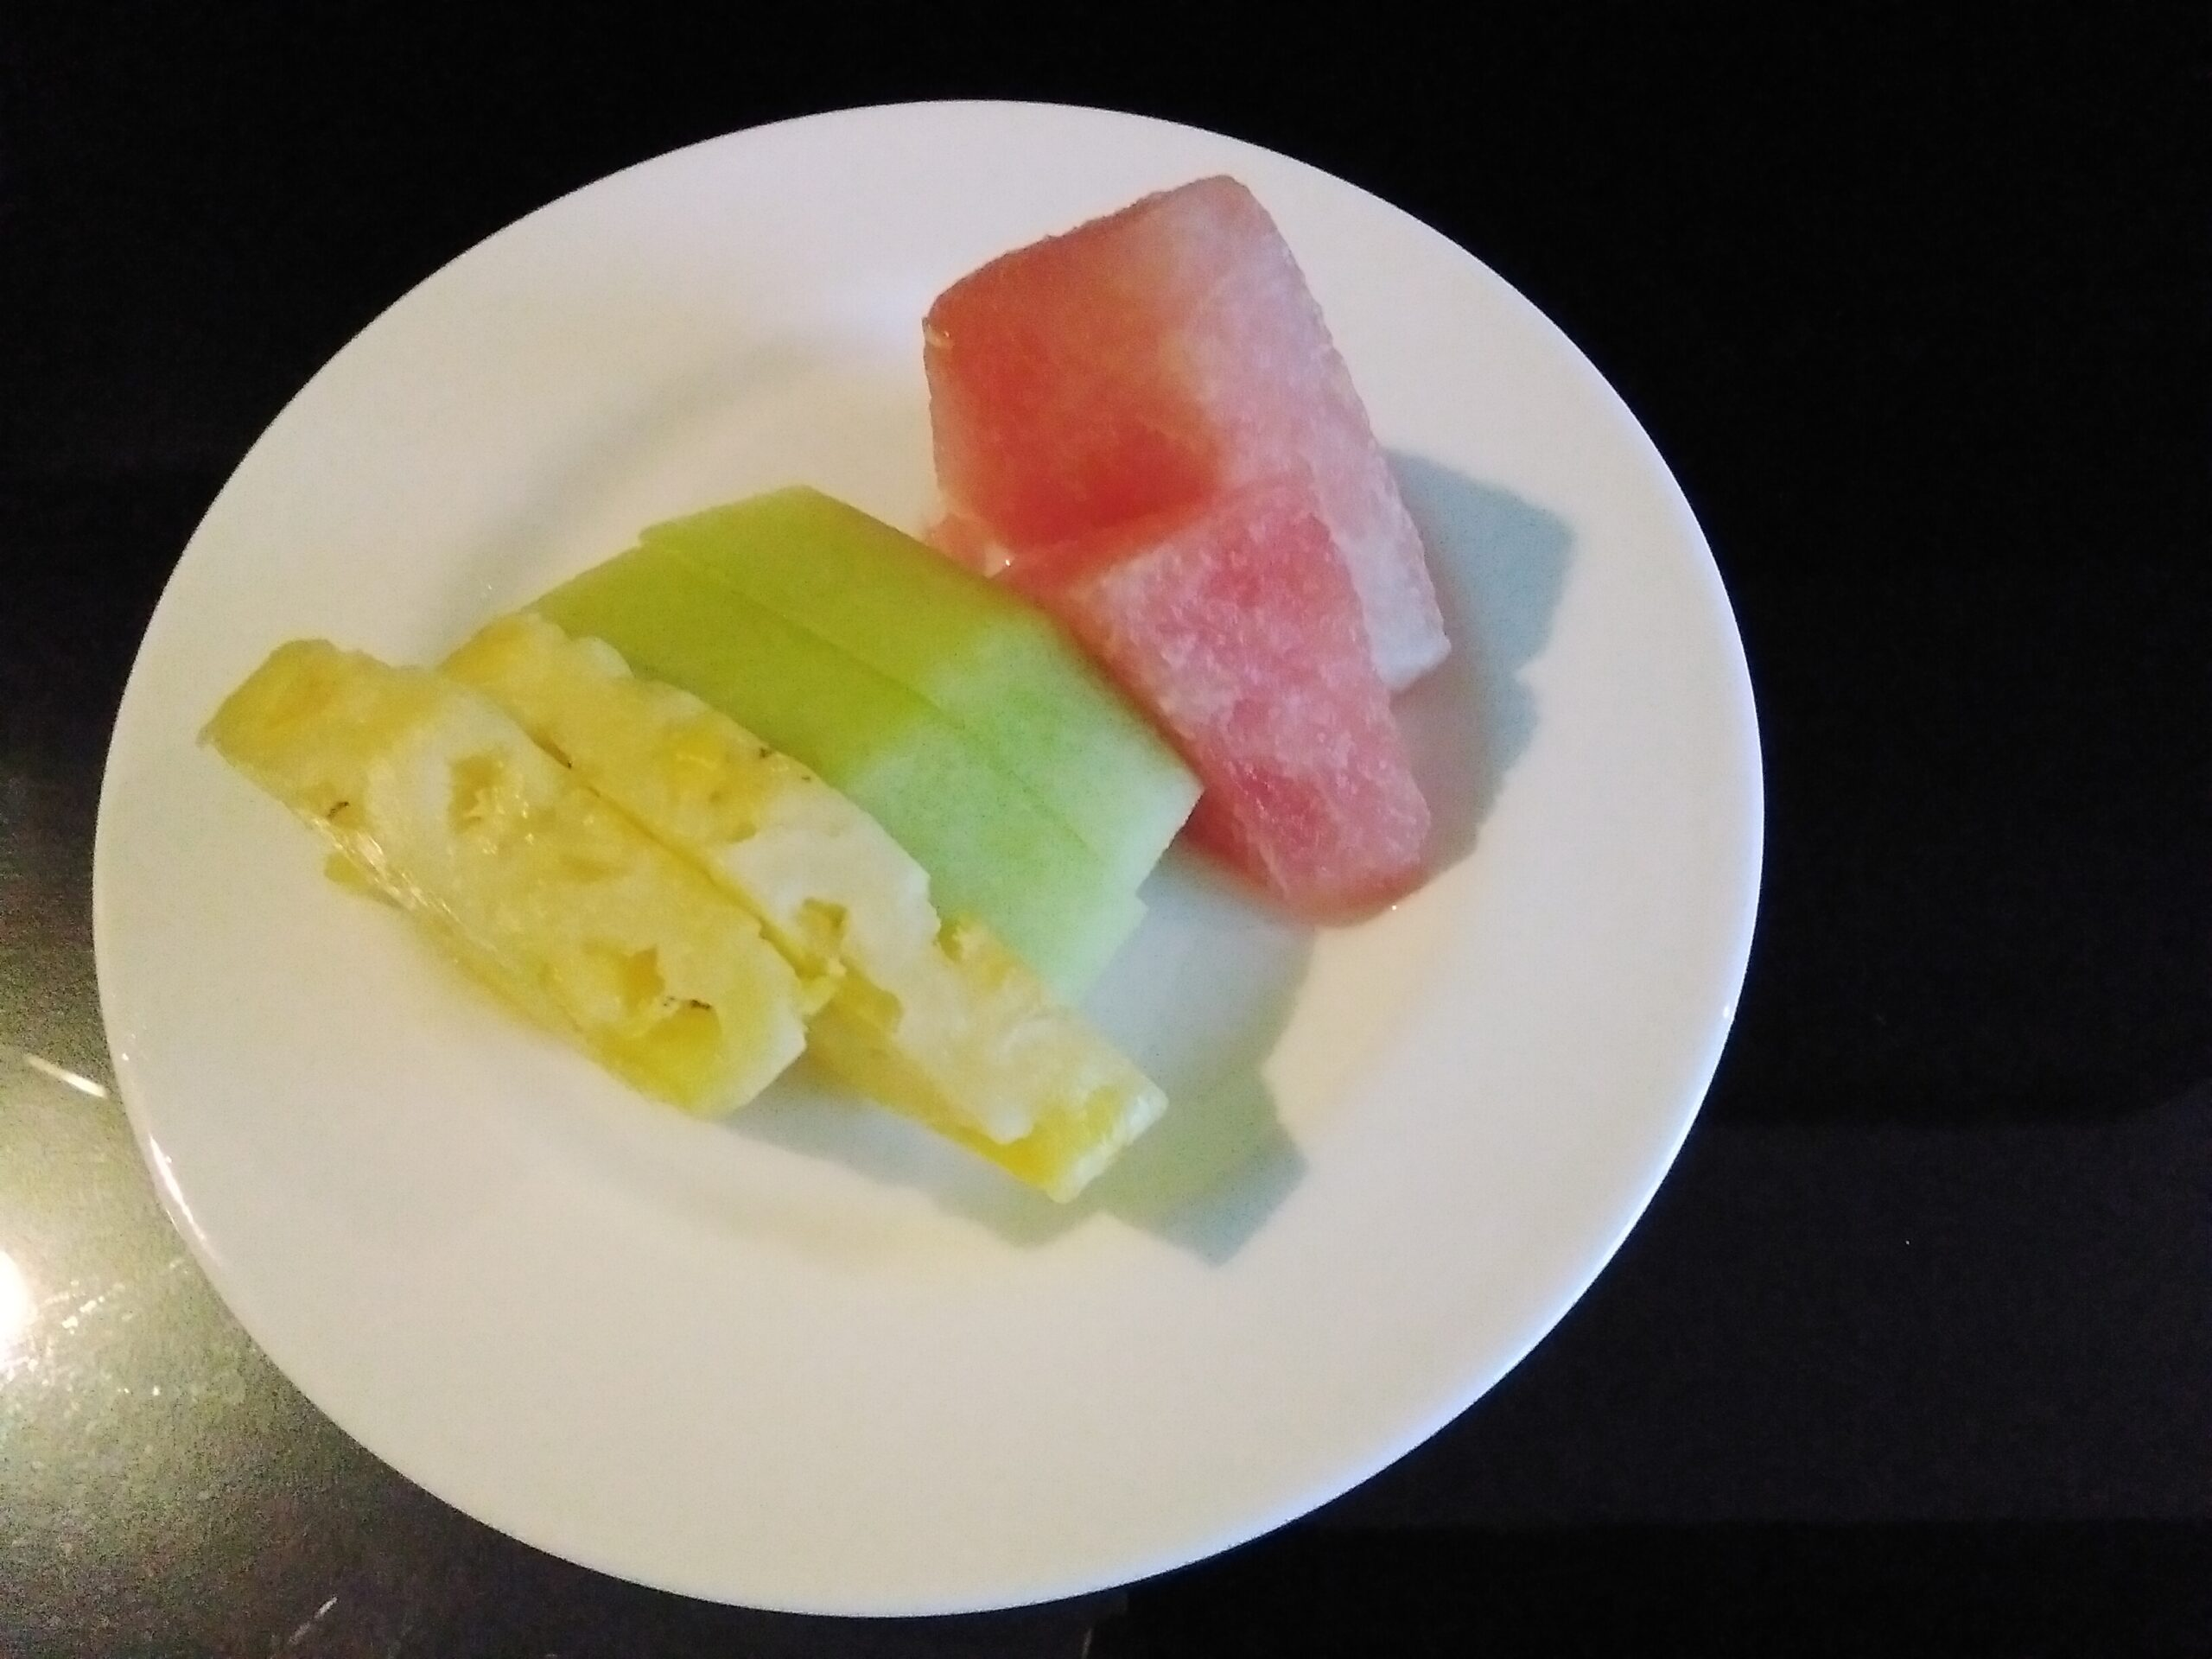 Sliced Tropical Fruits